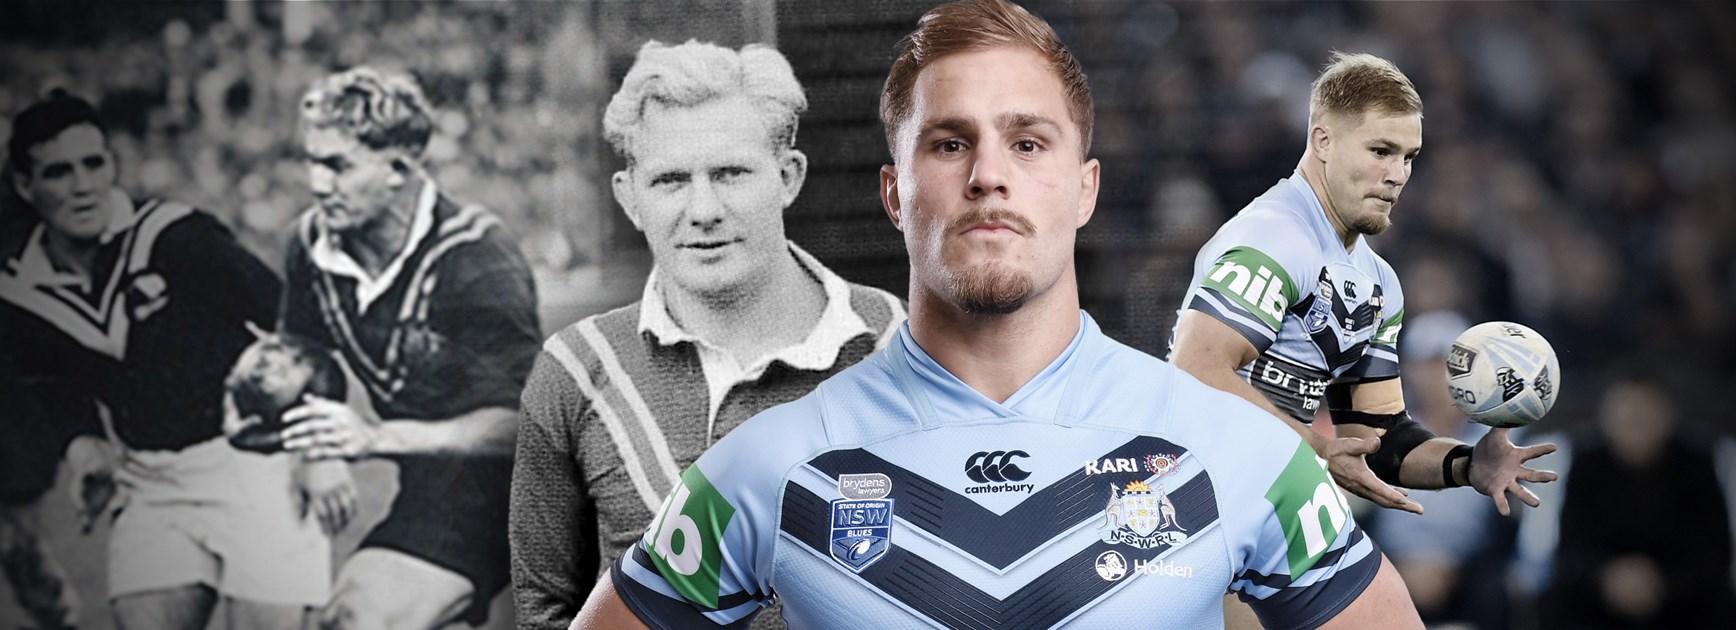 De Belin chases grandfather's Kangaroos jersey